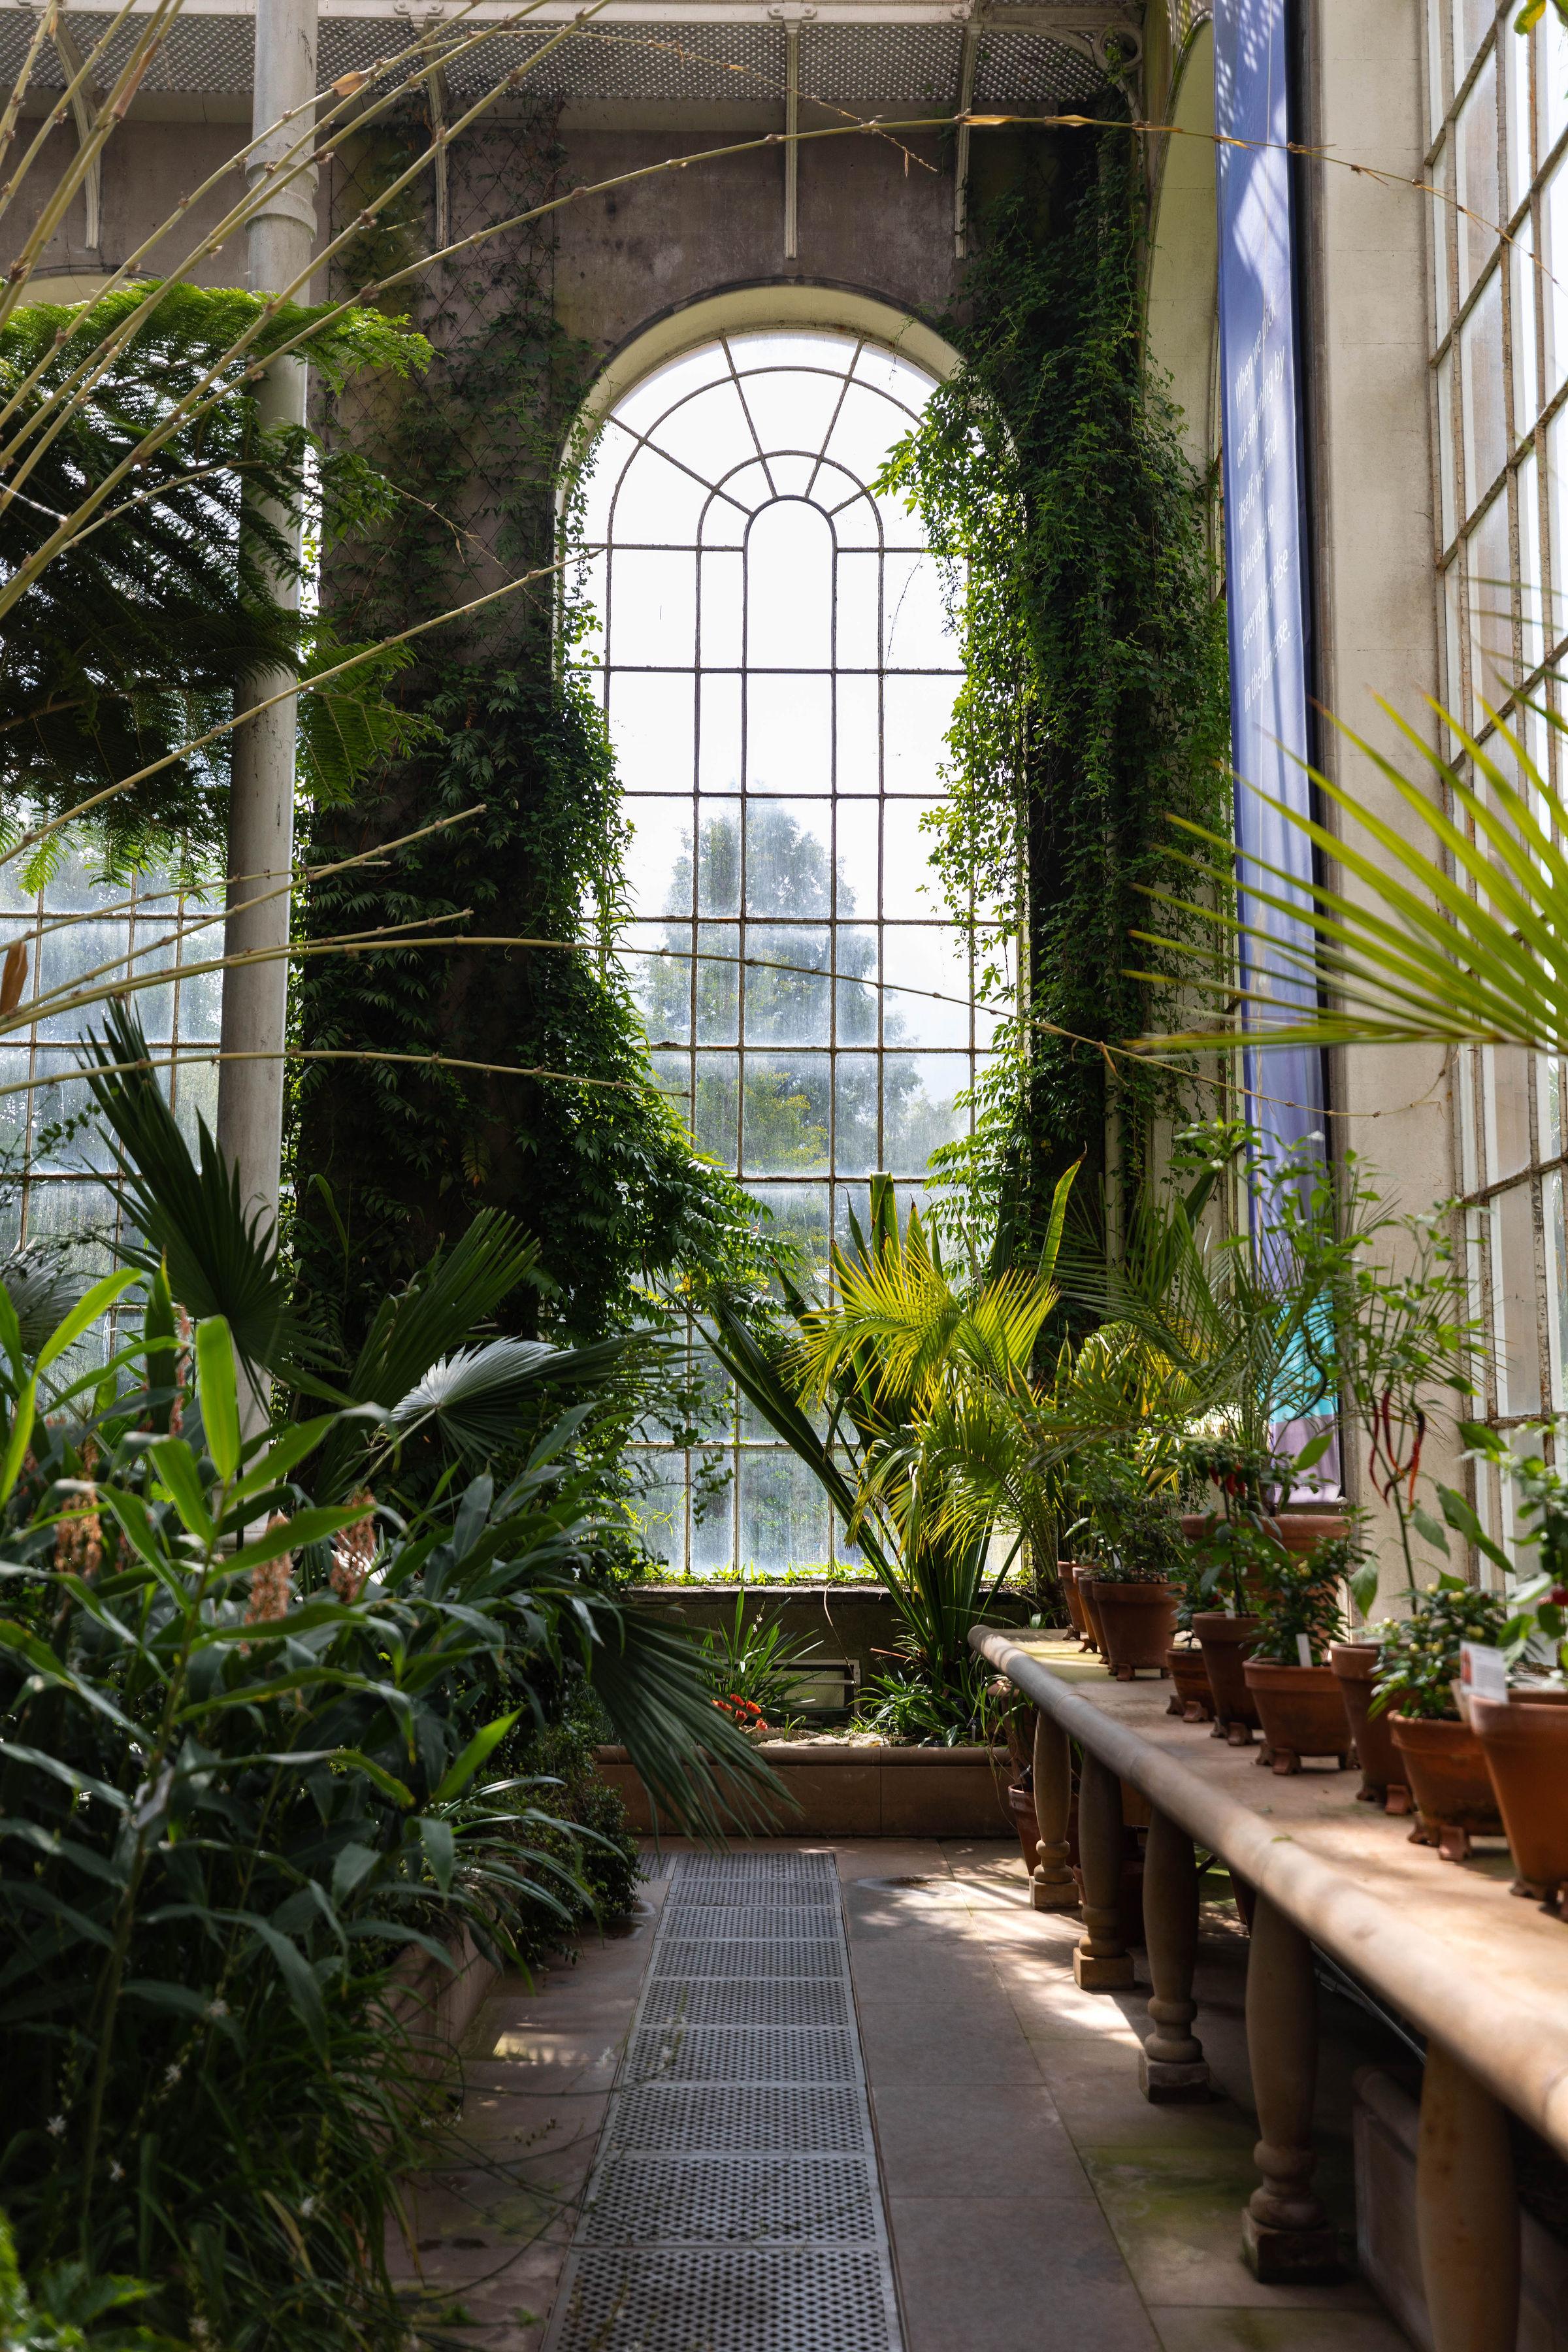 Temperate Palm House Glasshouse at Royal Botanic Gardens Edinburgh in Edinburgh, Scotland United Kingdom